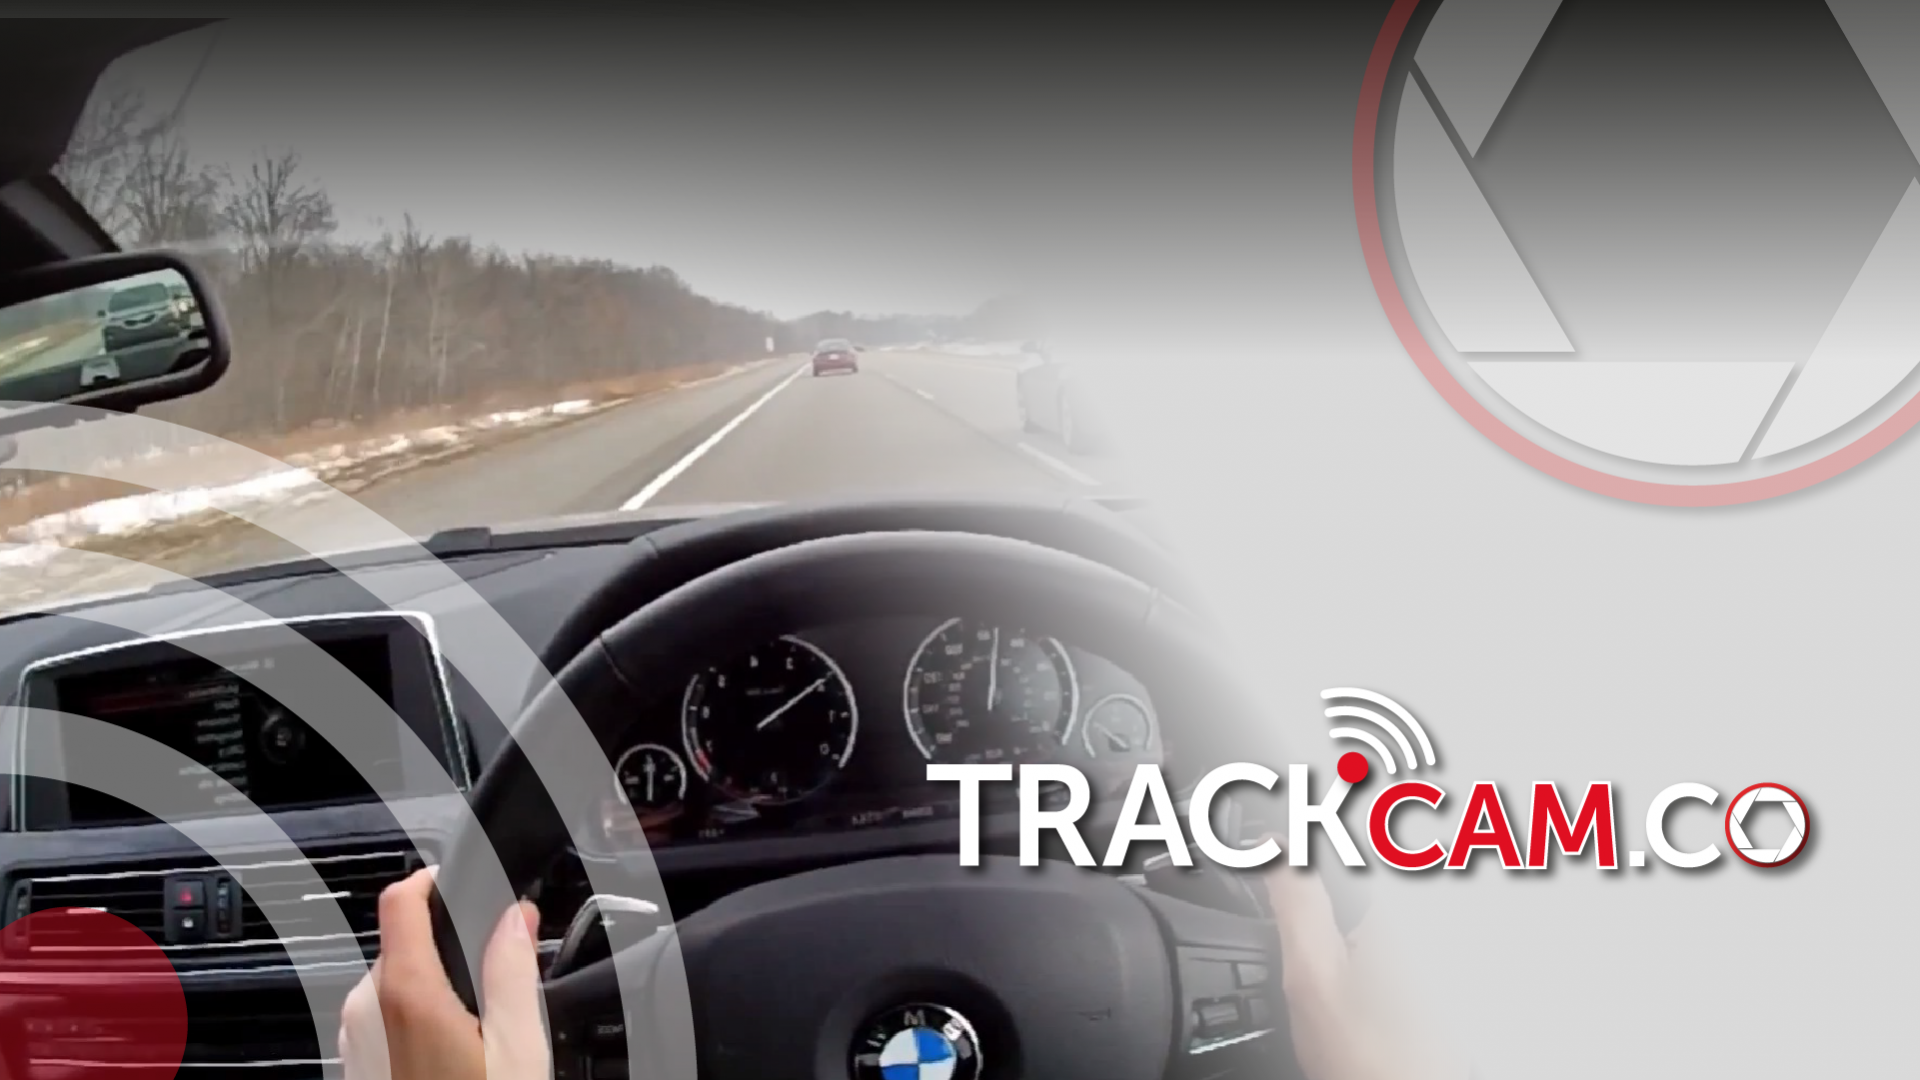 TrackCam.co